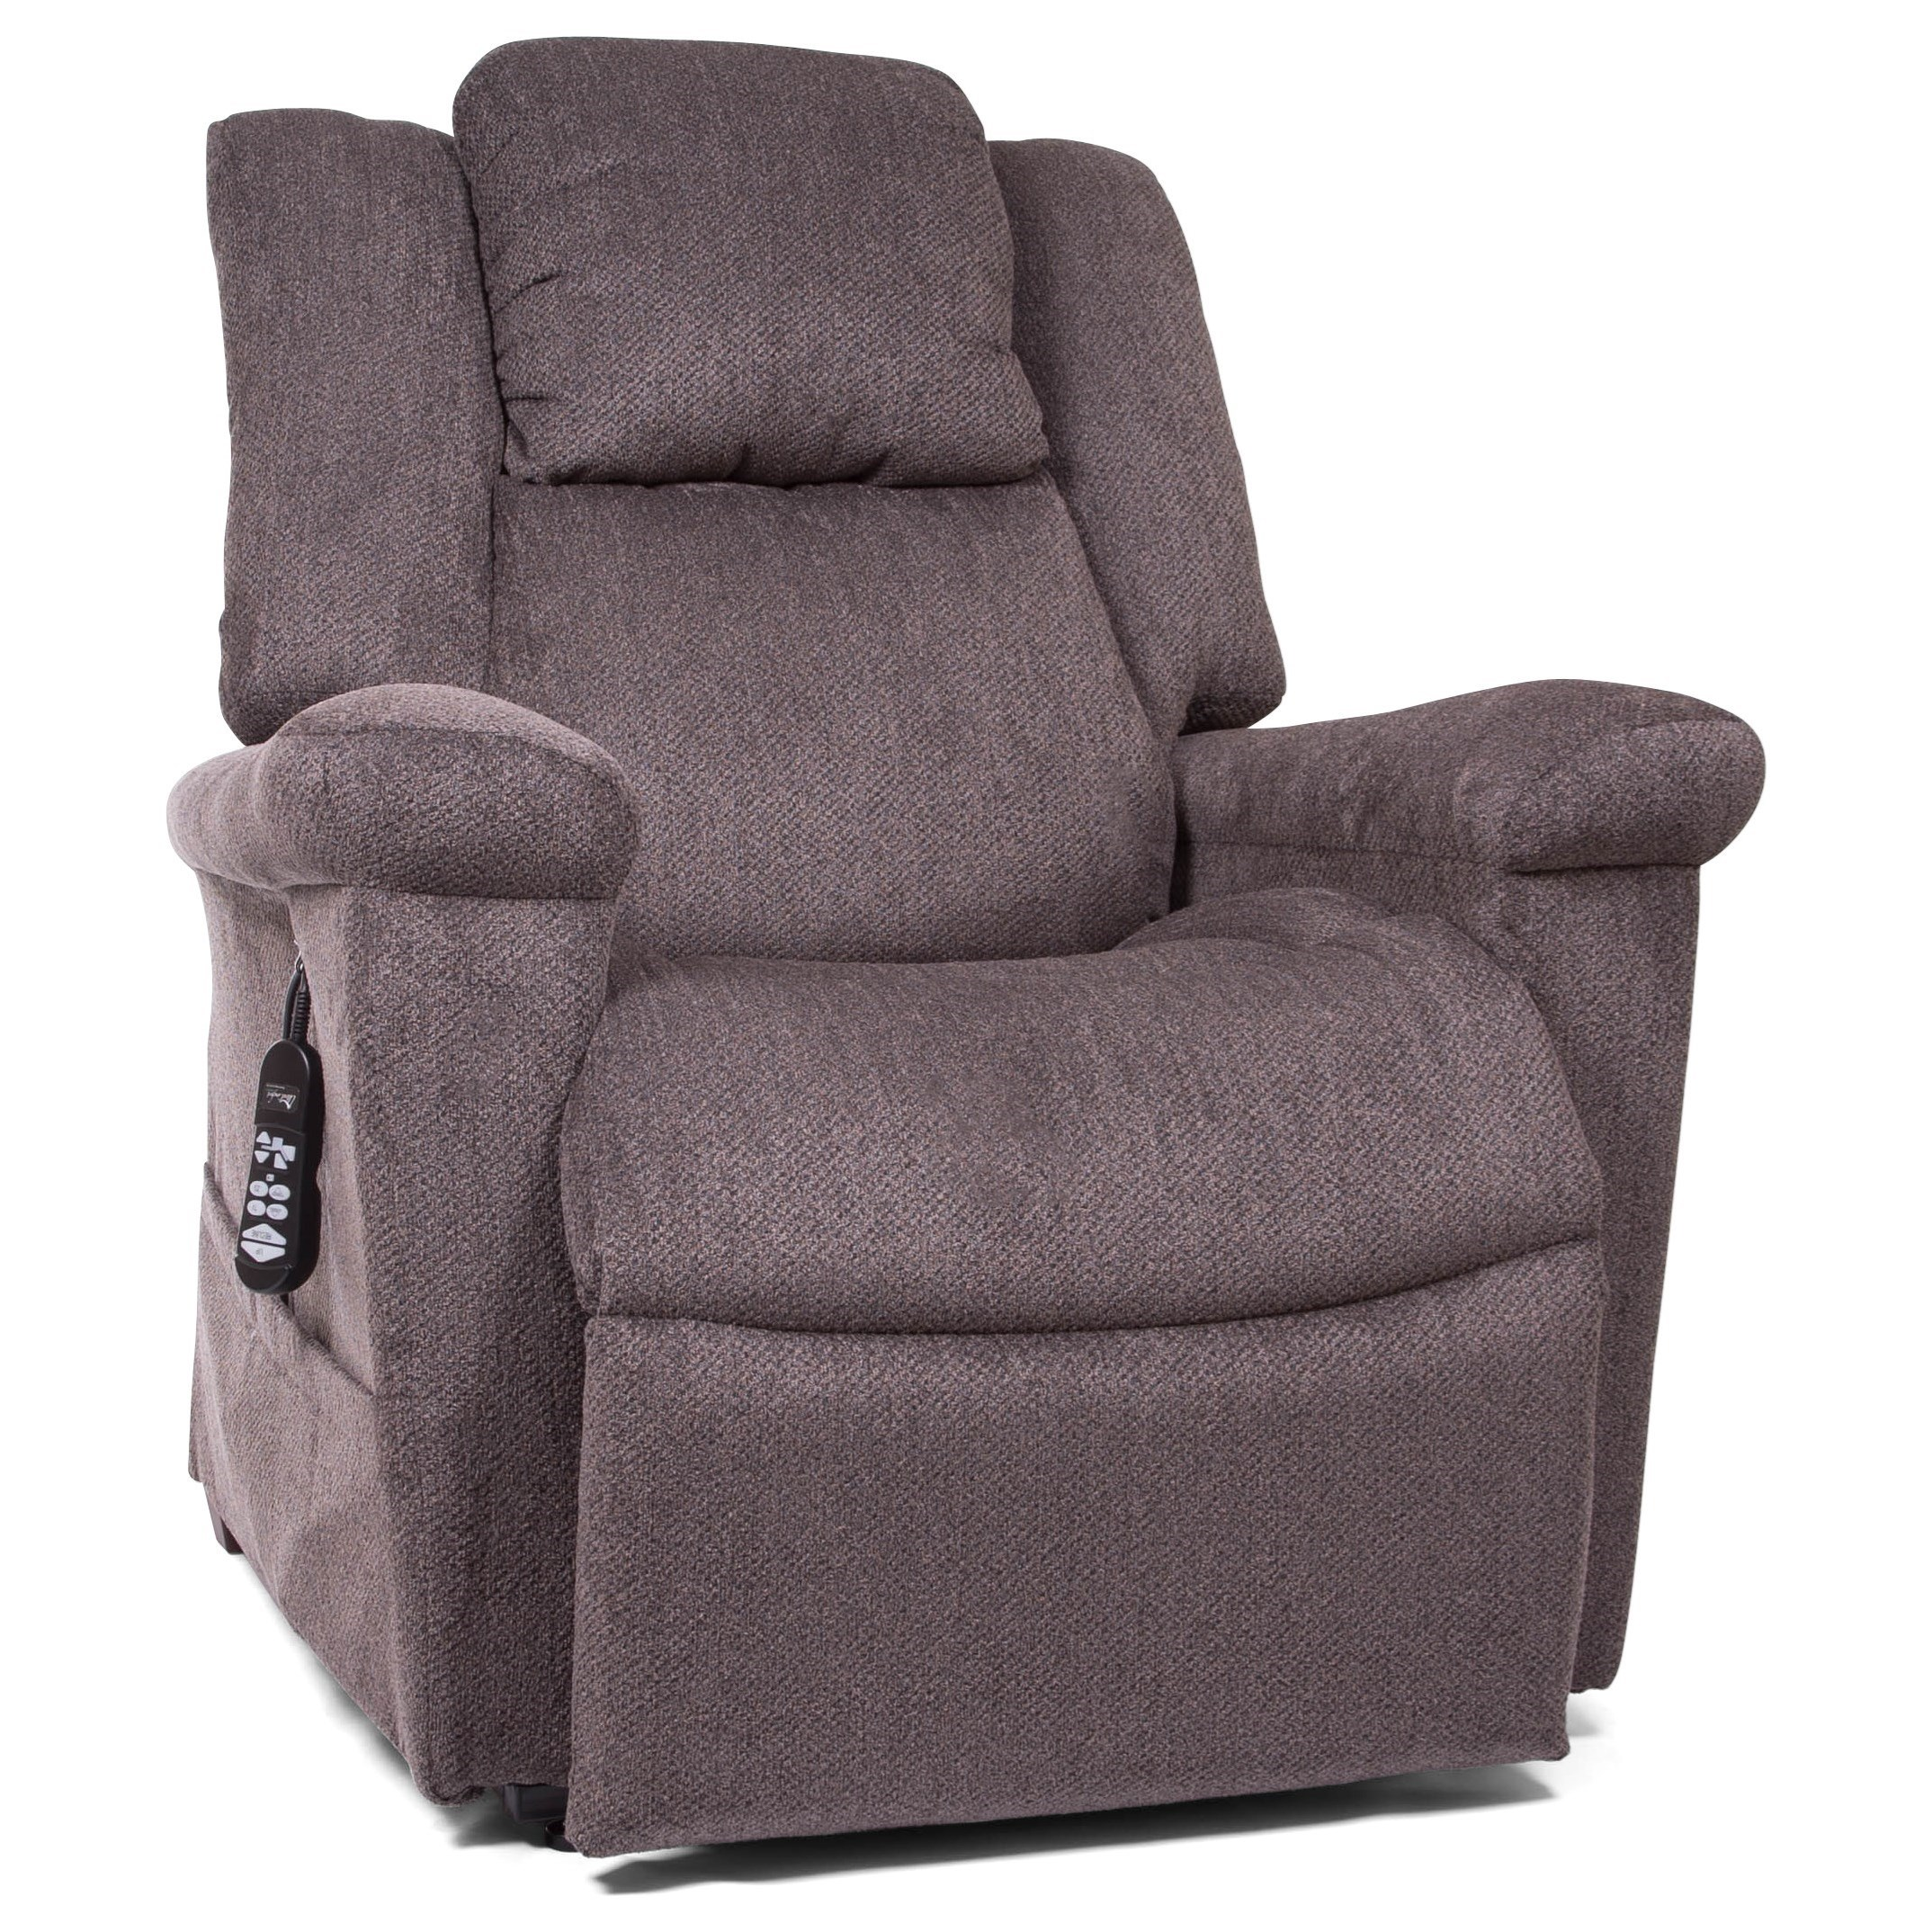 StellarComfort DayDreamer Power Pillow Lift Chair by UltraComfort at Johnny Janosik